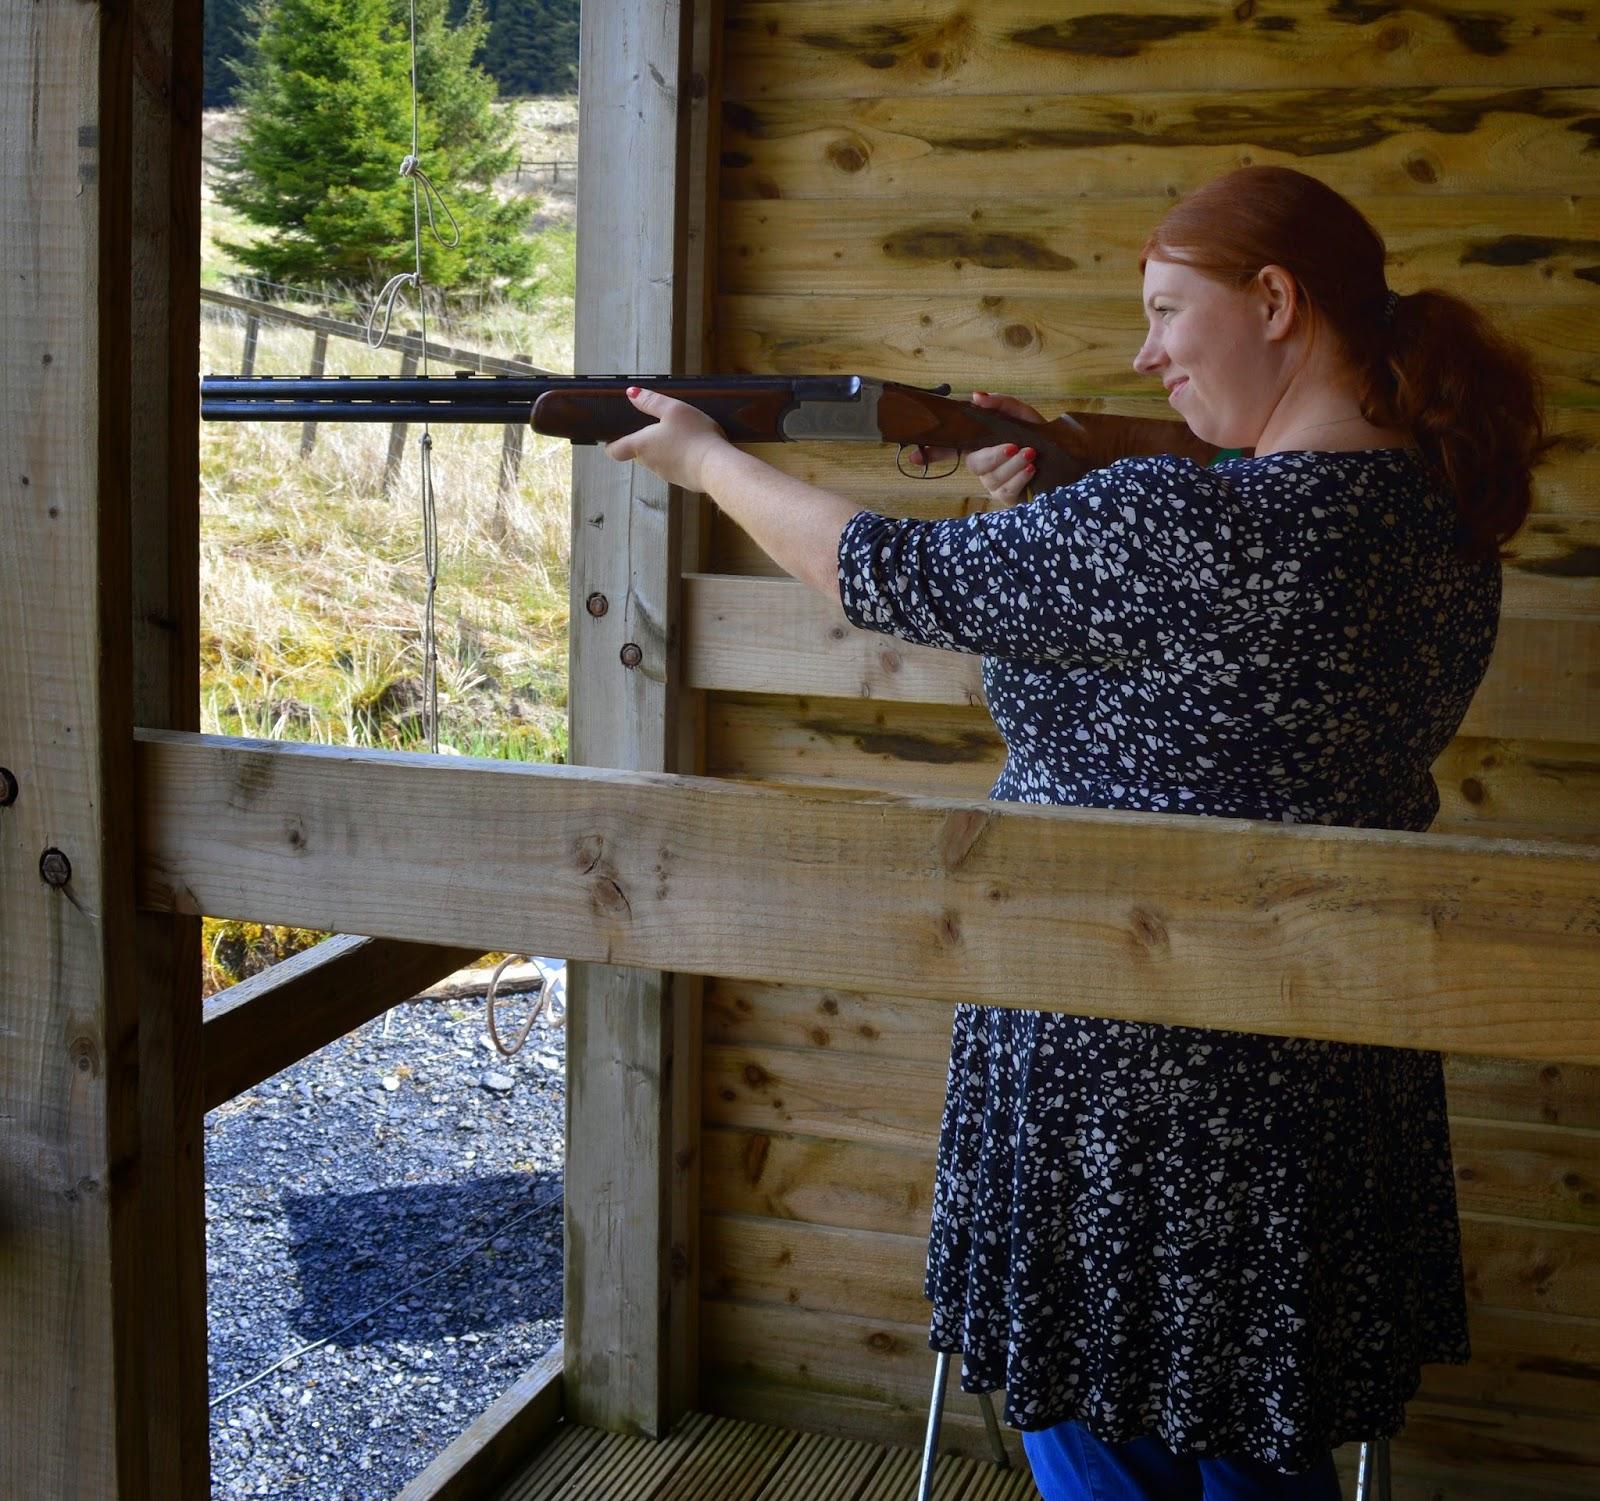 Laser Clay Shooting at The Calvert Trust, Kielder - A review